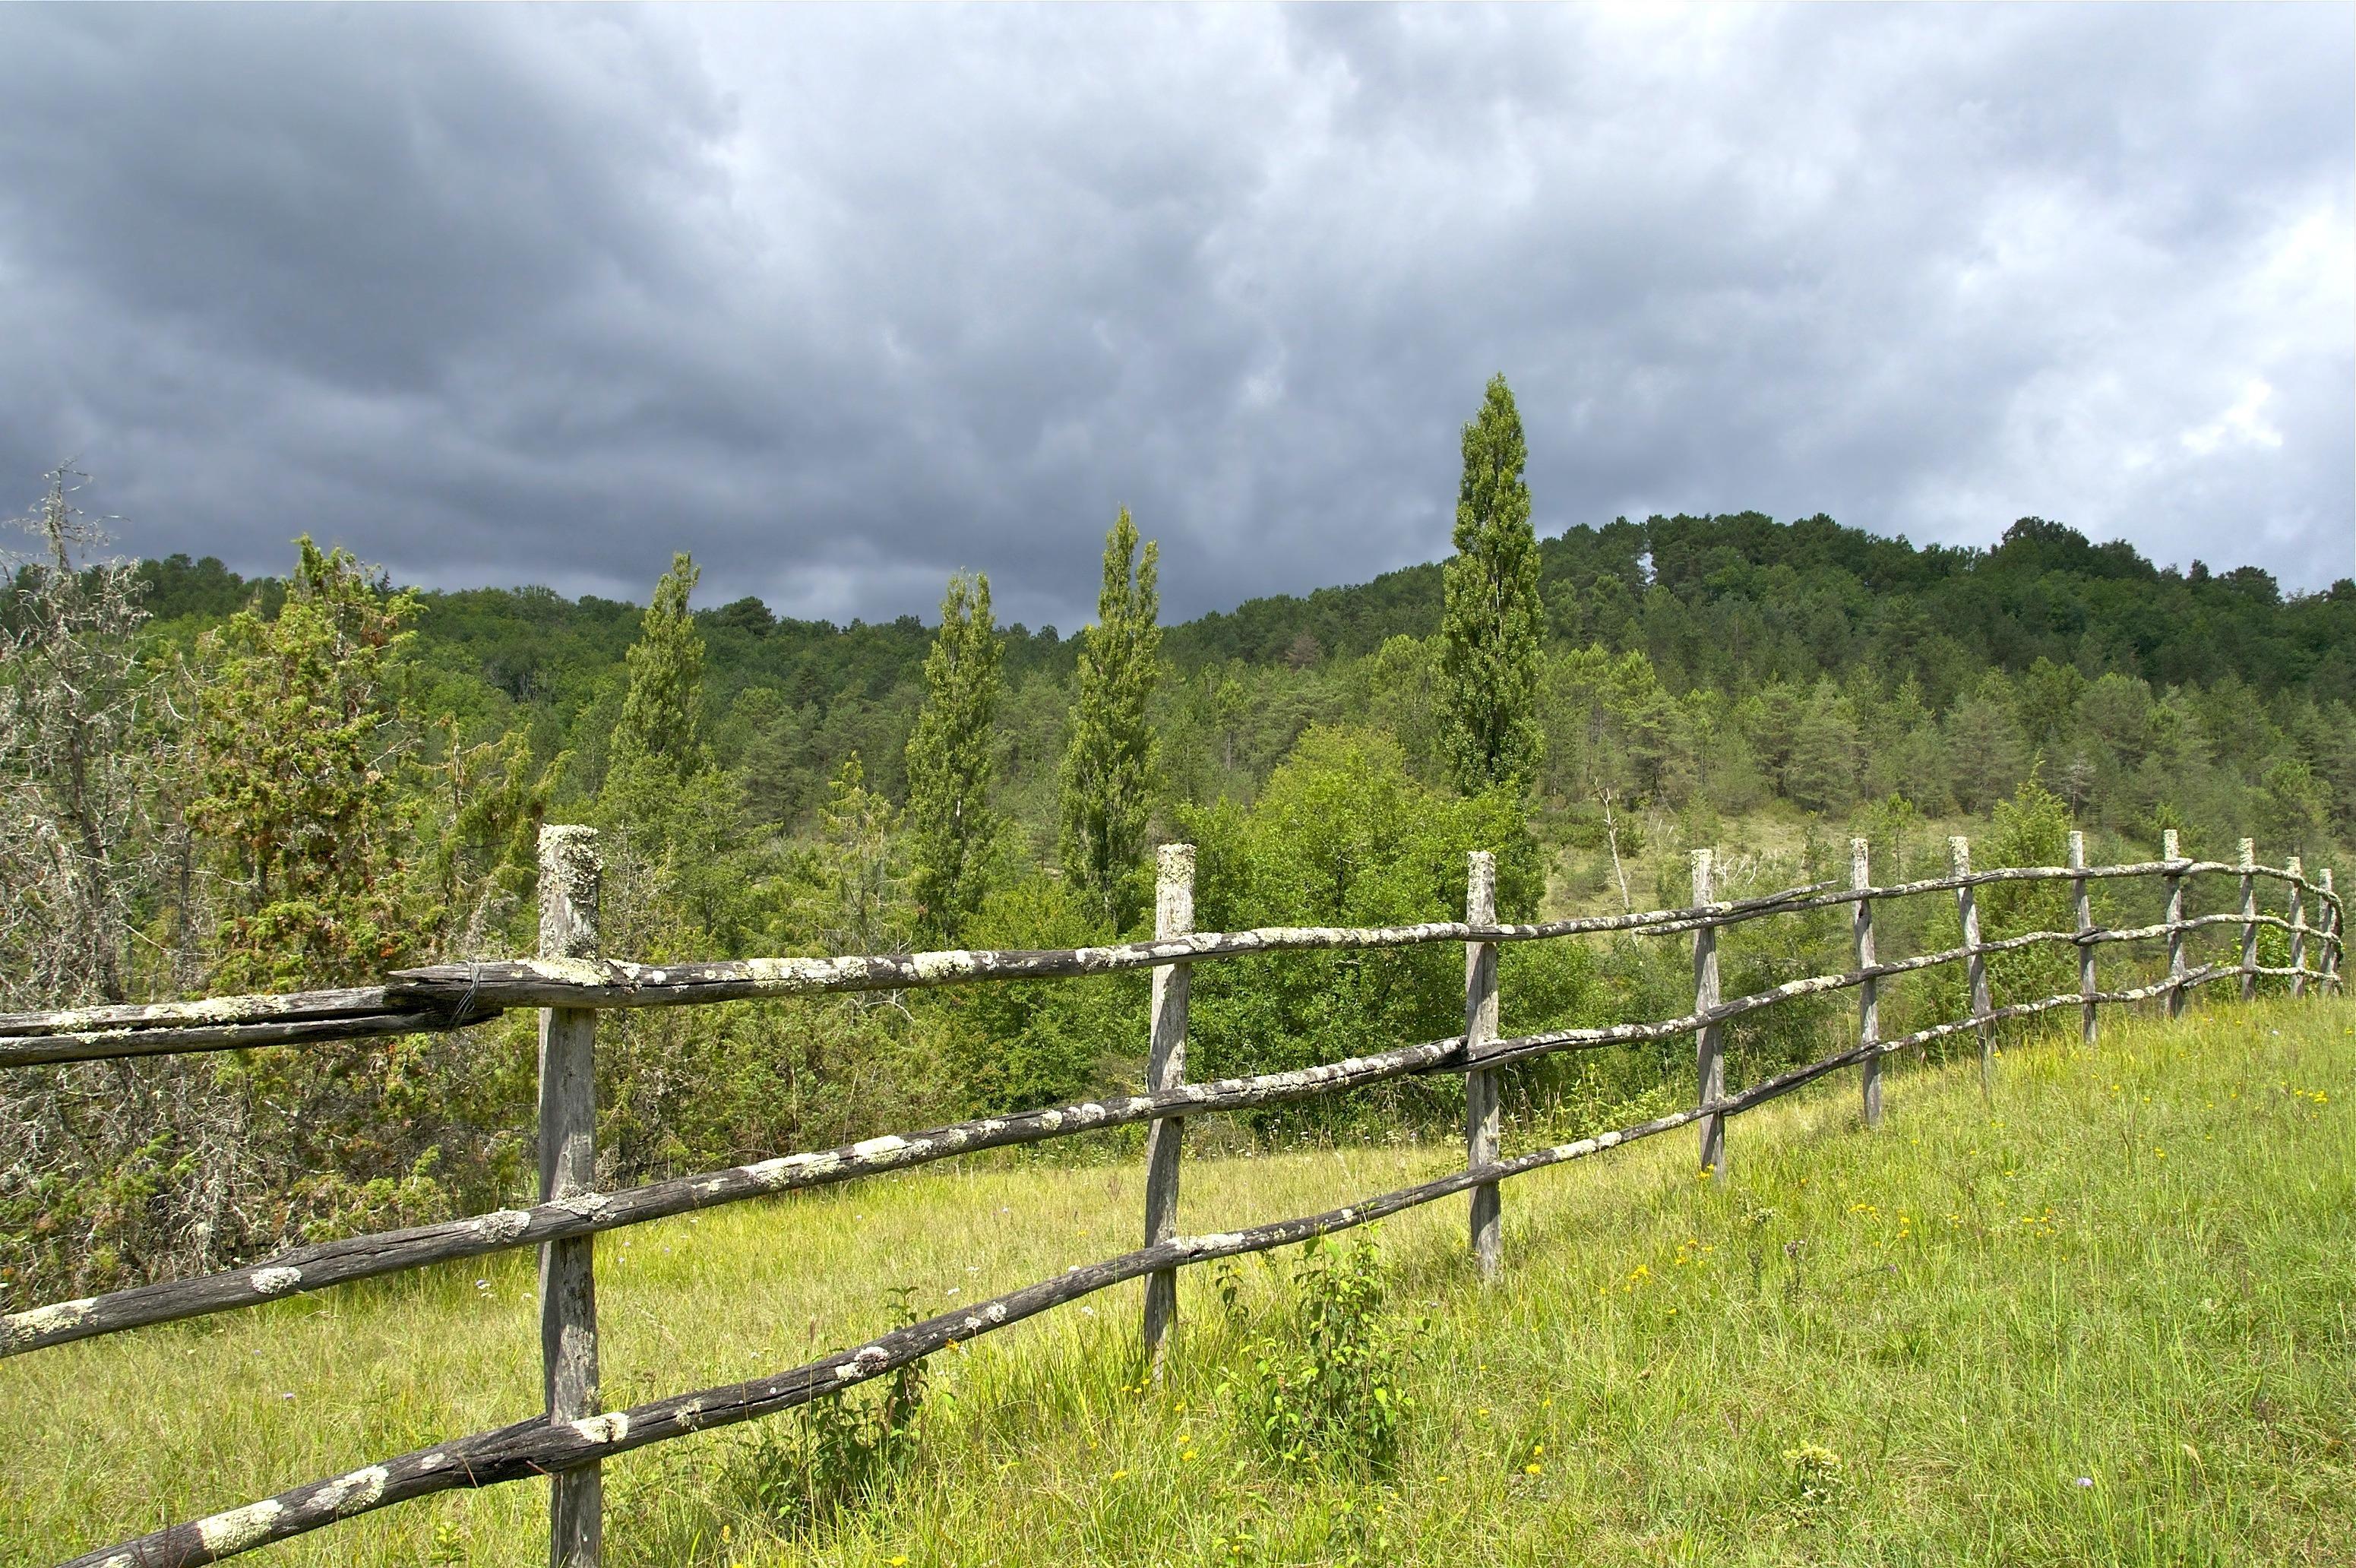 images gratuites paysage arbre for t herbe ciel vignoble champ ferme prairie campagne. Black Bedroom Furniture Sets. Home Design Ideas